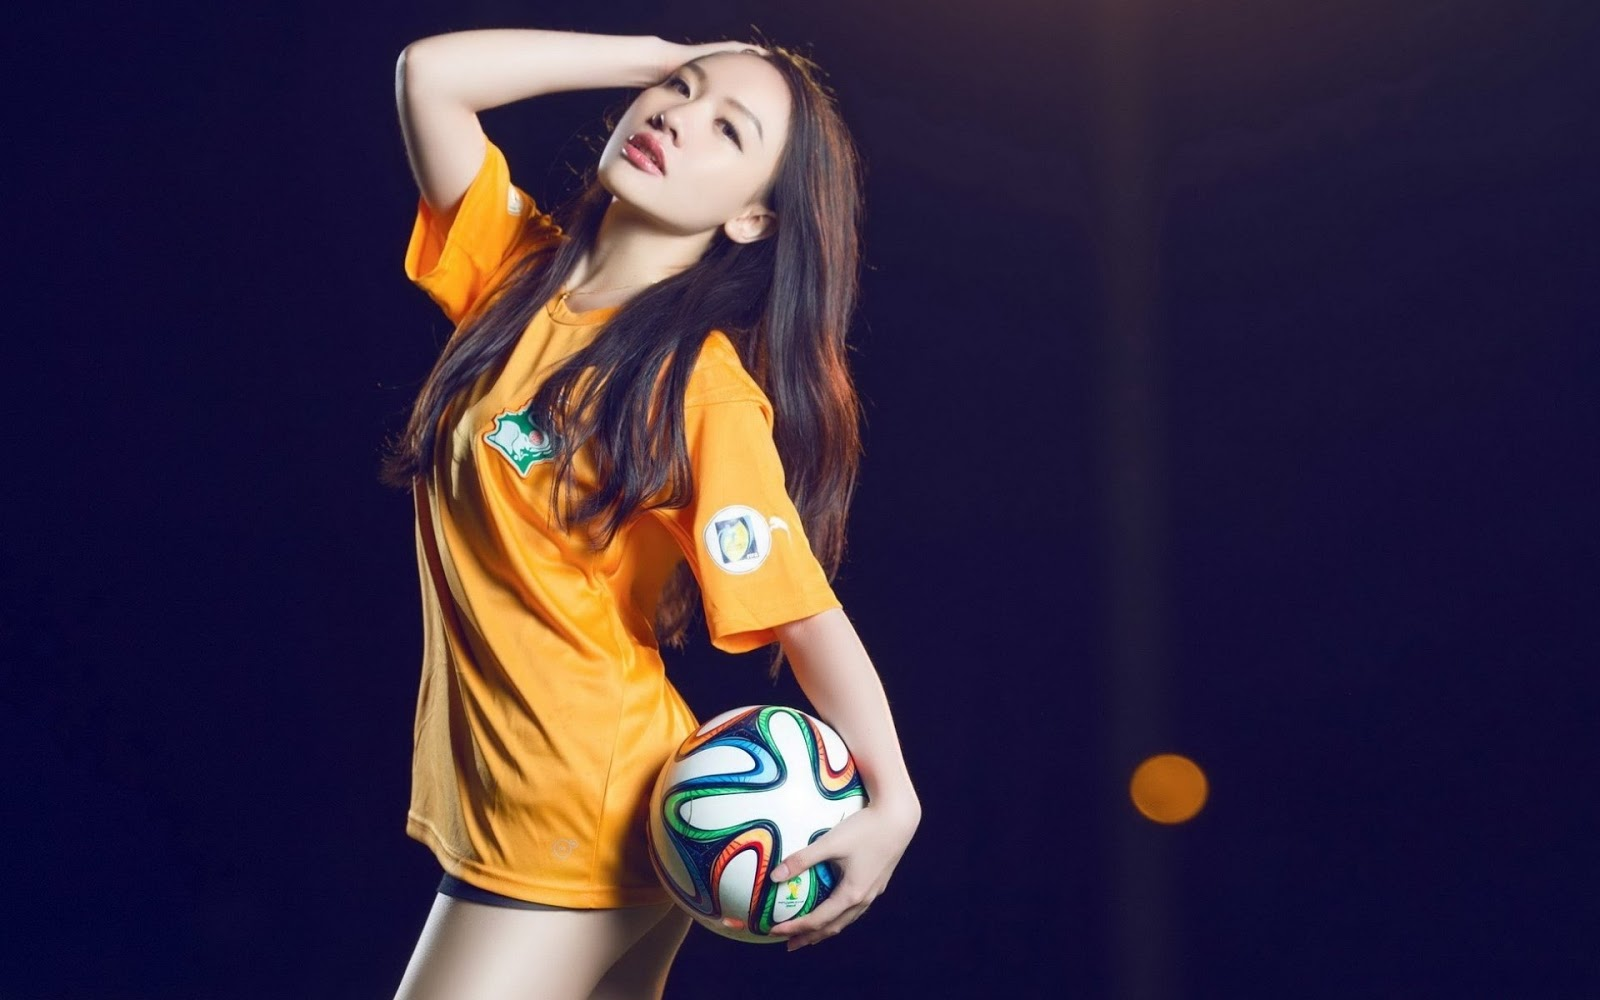 Beberapa Alasan Berbahaya Jika Bermain di Agen Bola Online yang Tidak Terpercaya - Part 2